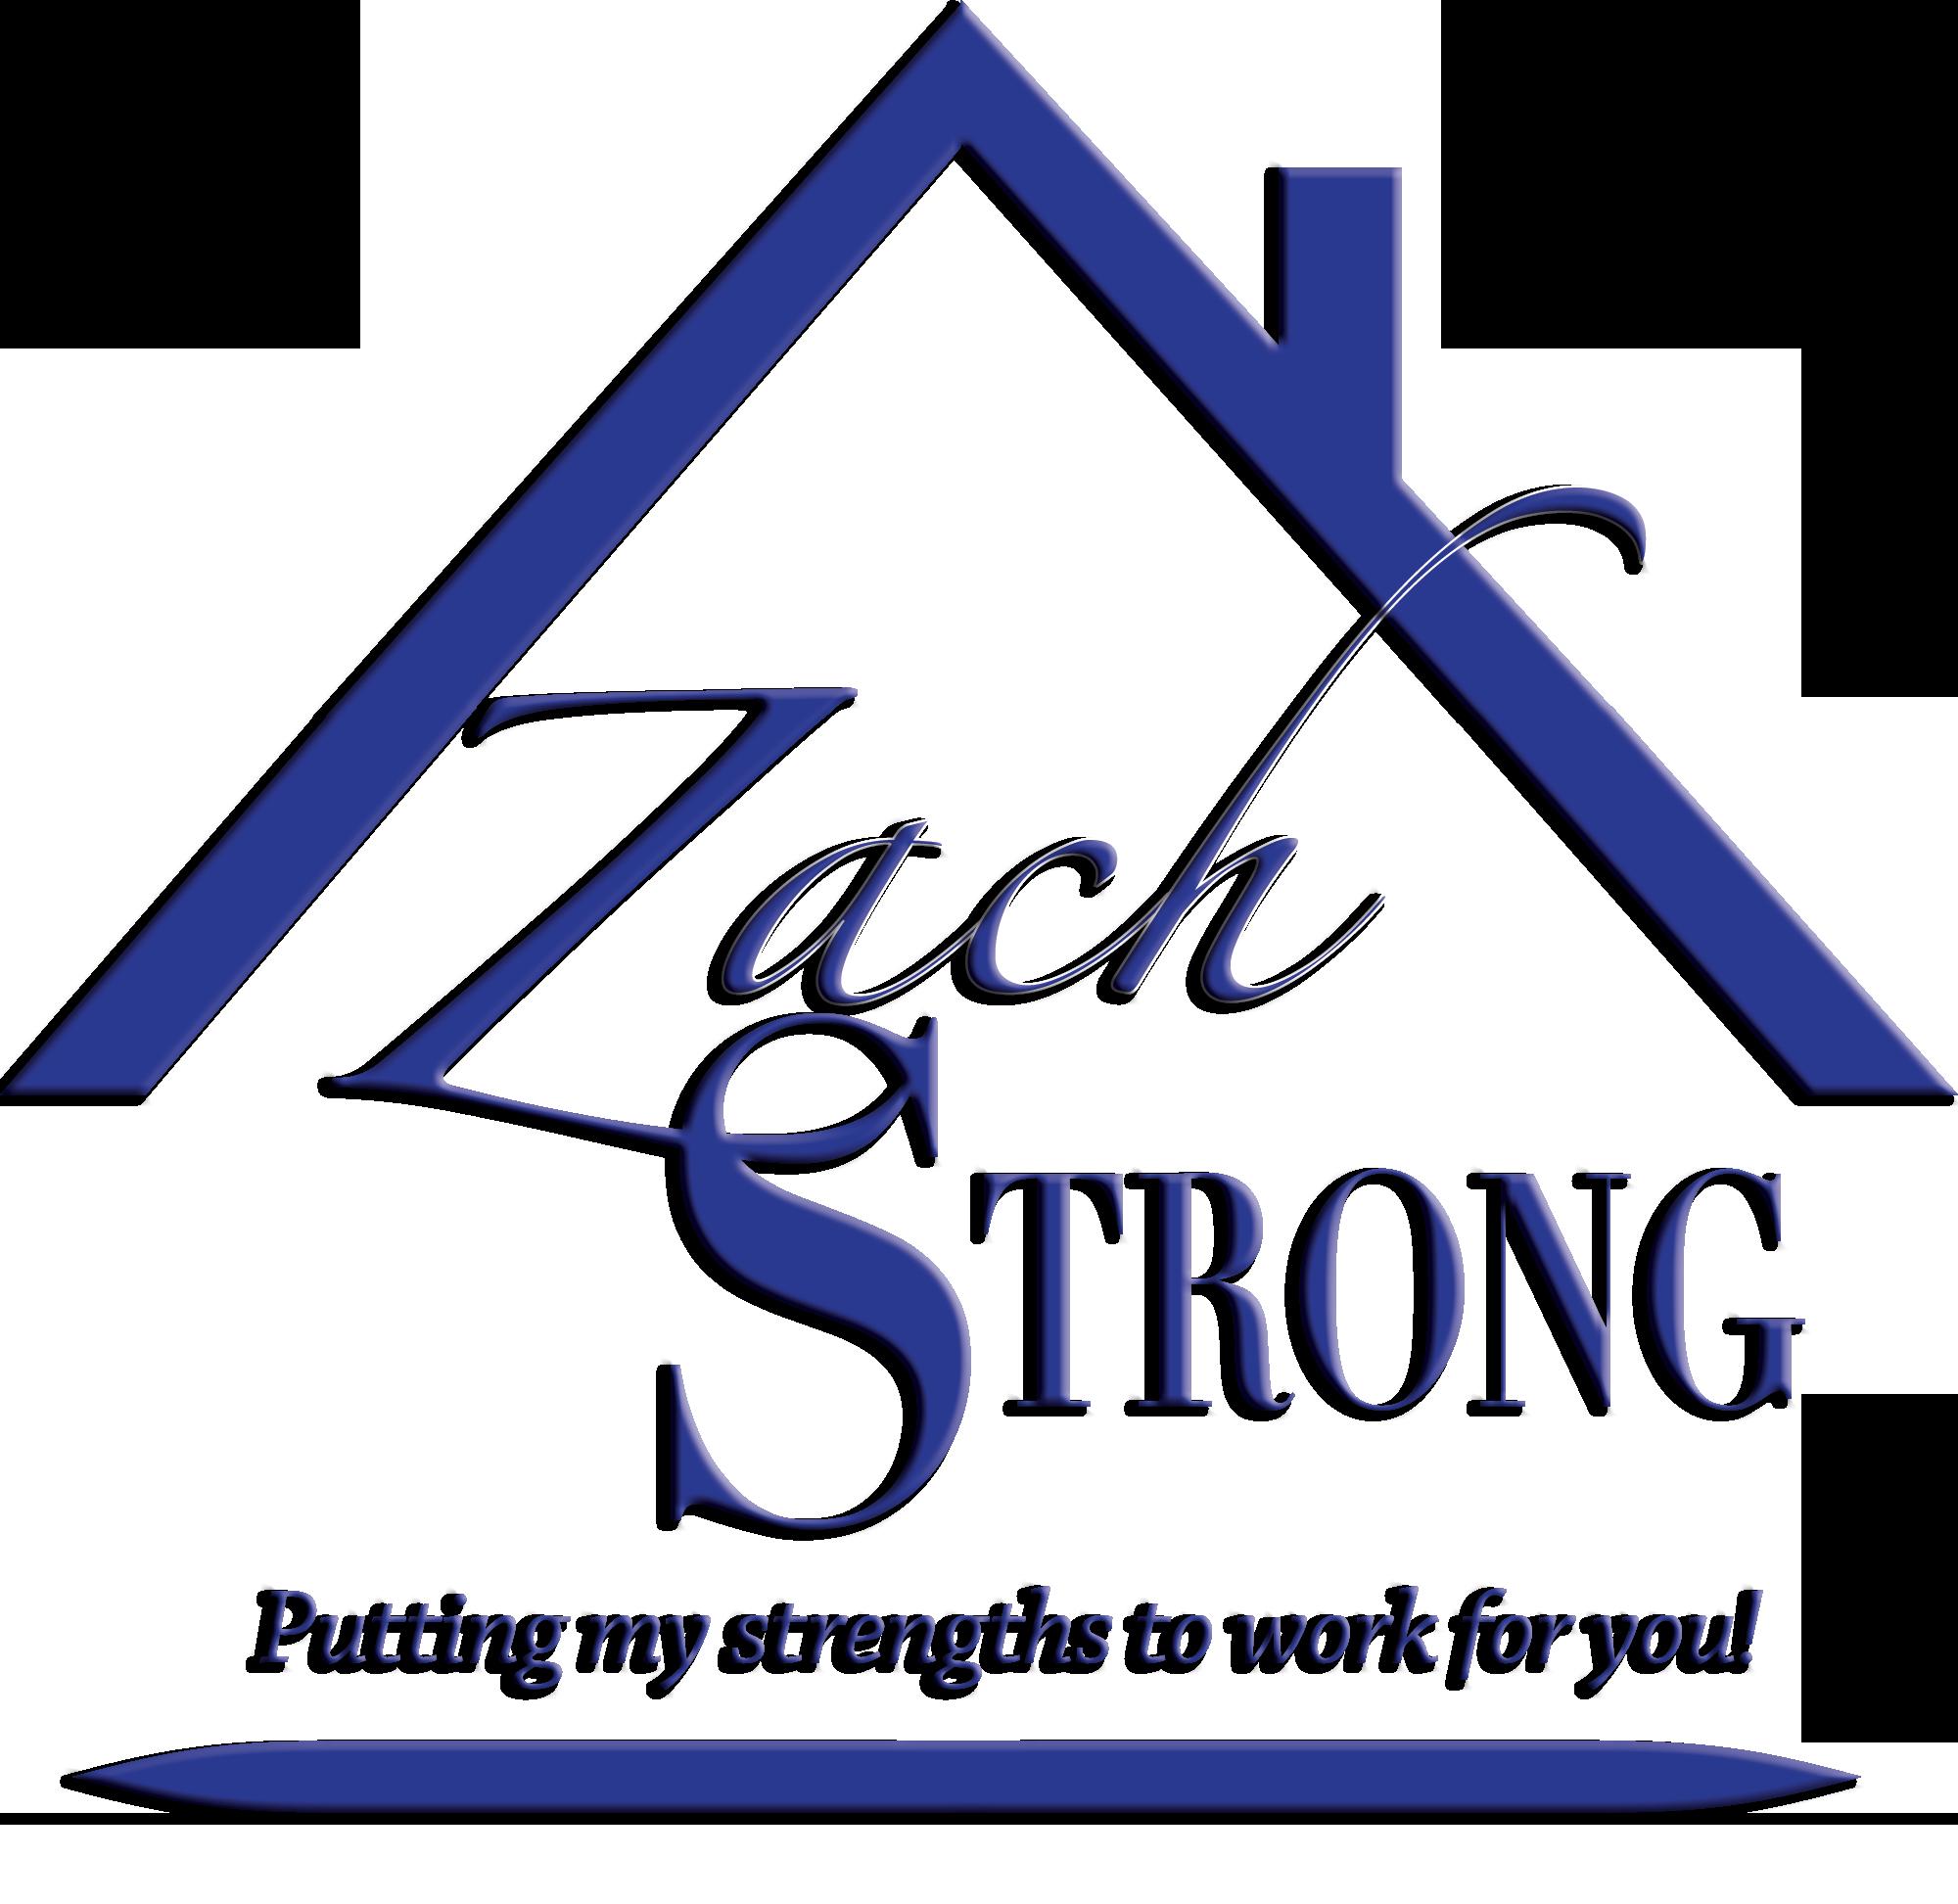 Zack-Stong-Logo-1.png